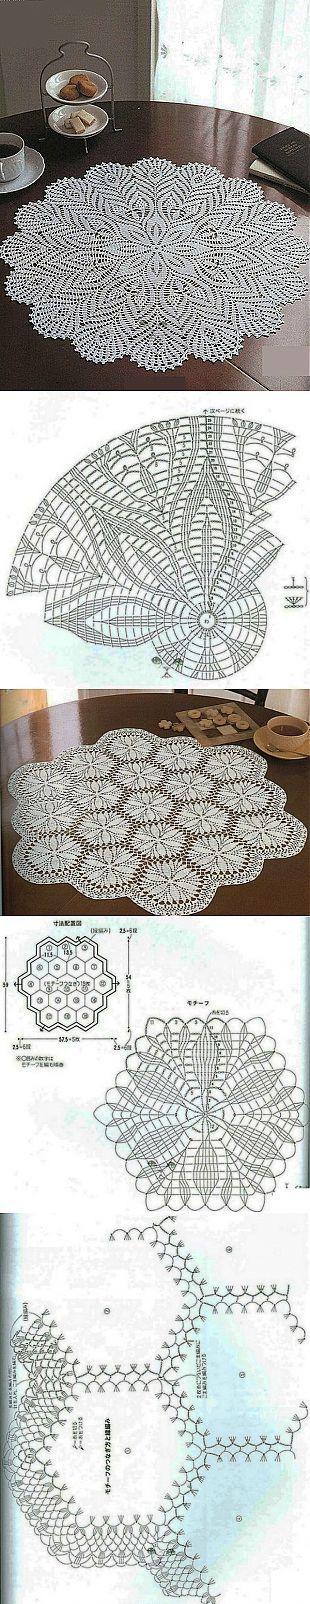 Схемы вязания салфеток: